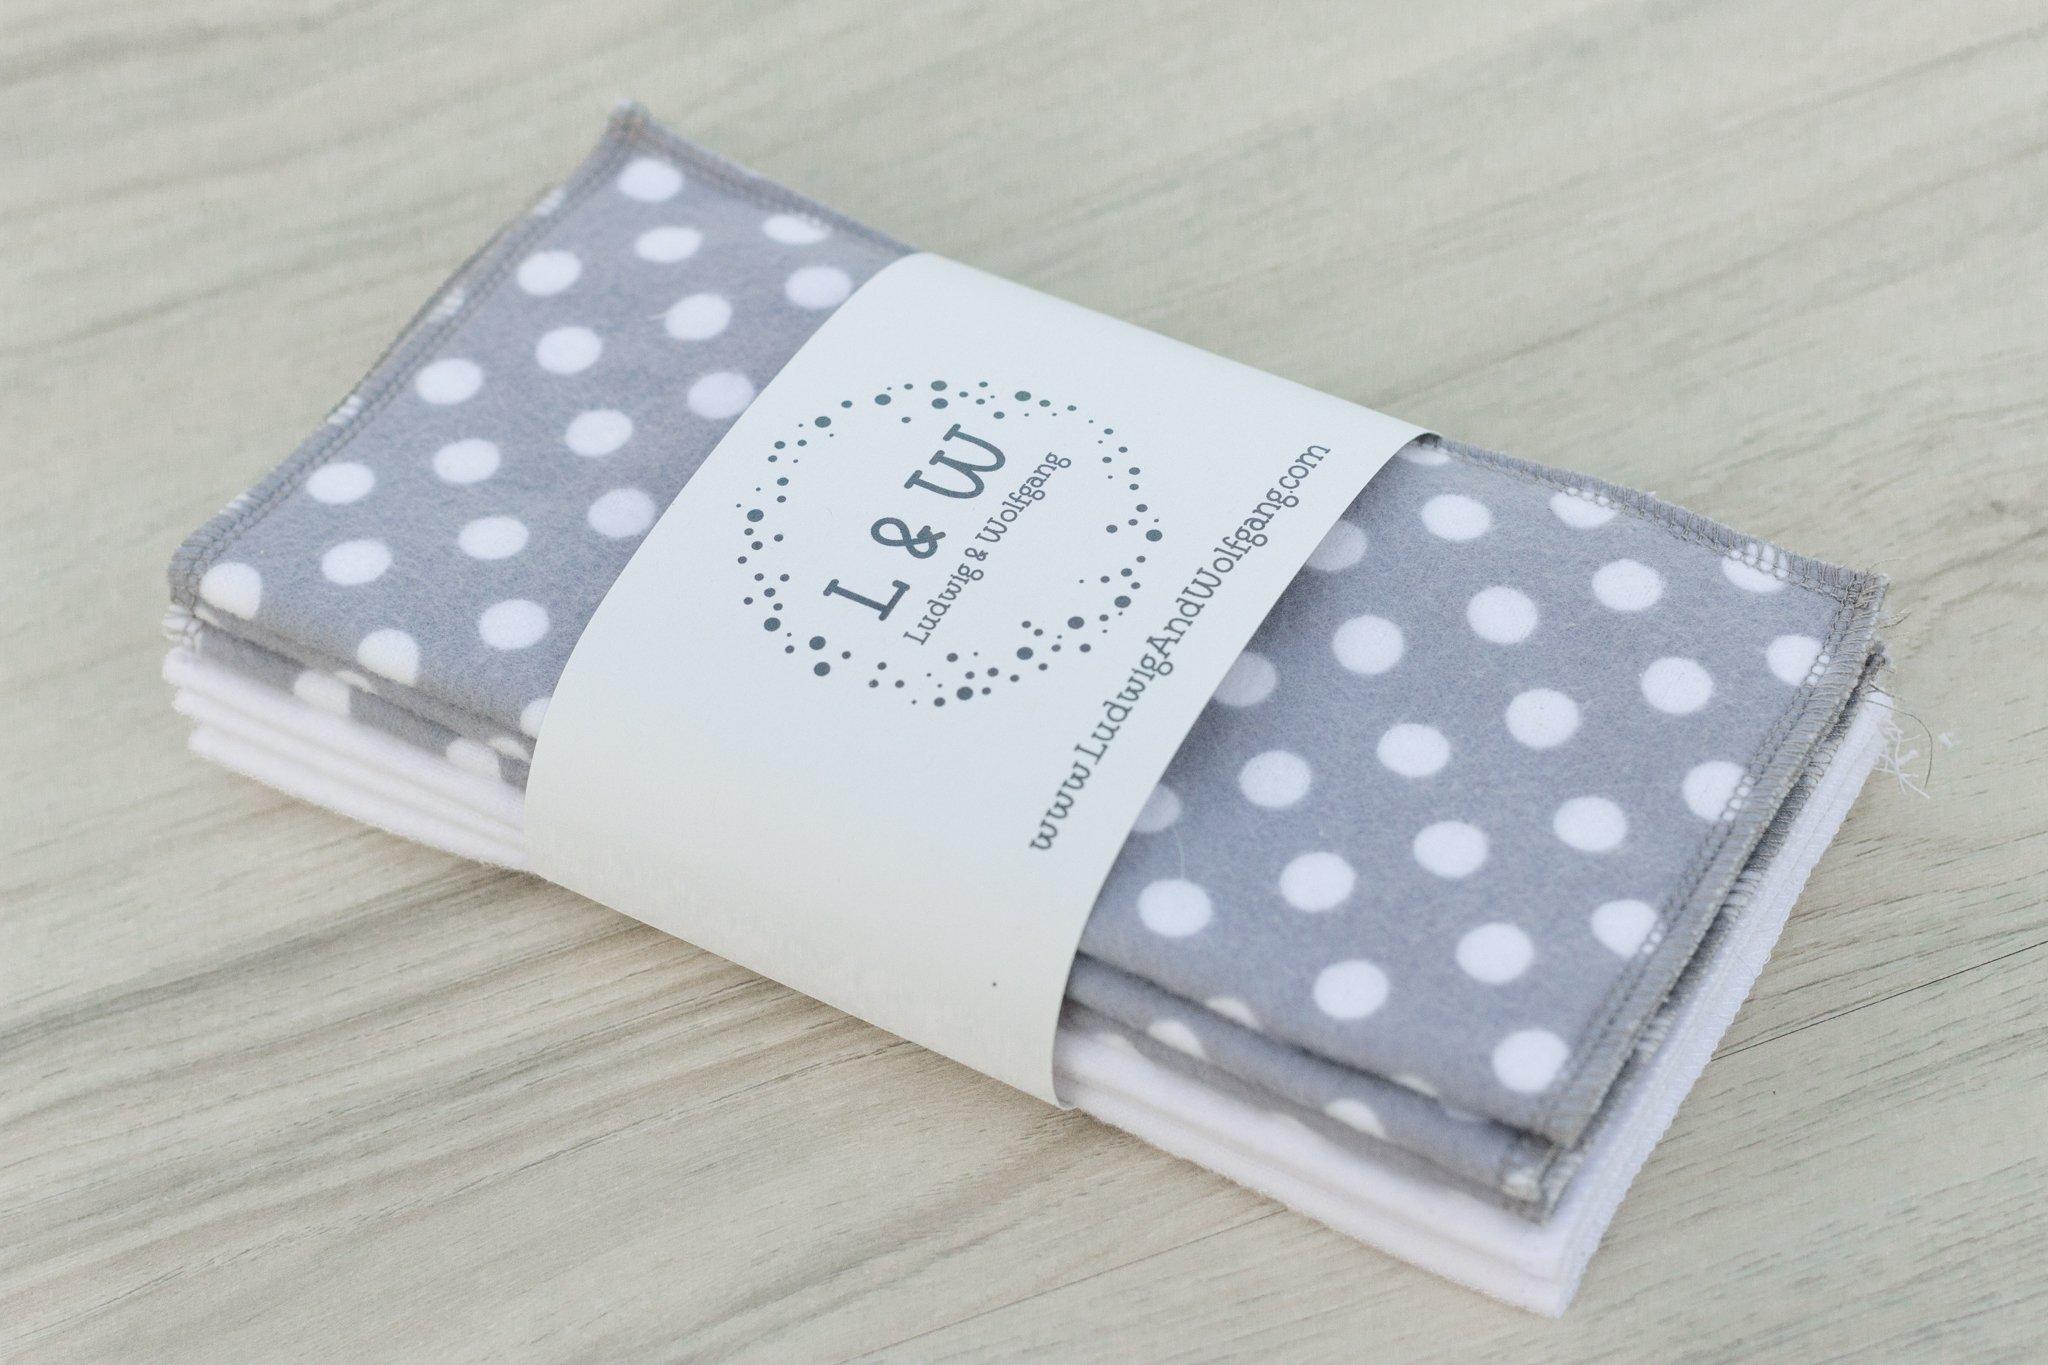 Bundle of Wipes (3 ea. White, Gray Polka Dot, 2-Ply Flannel)